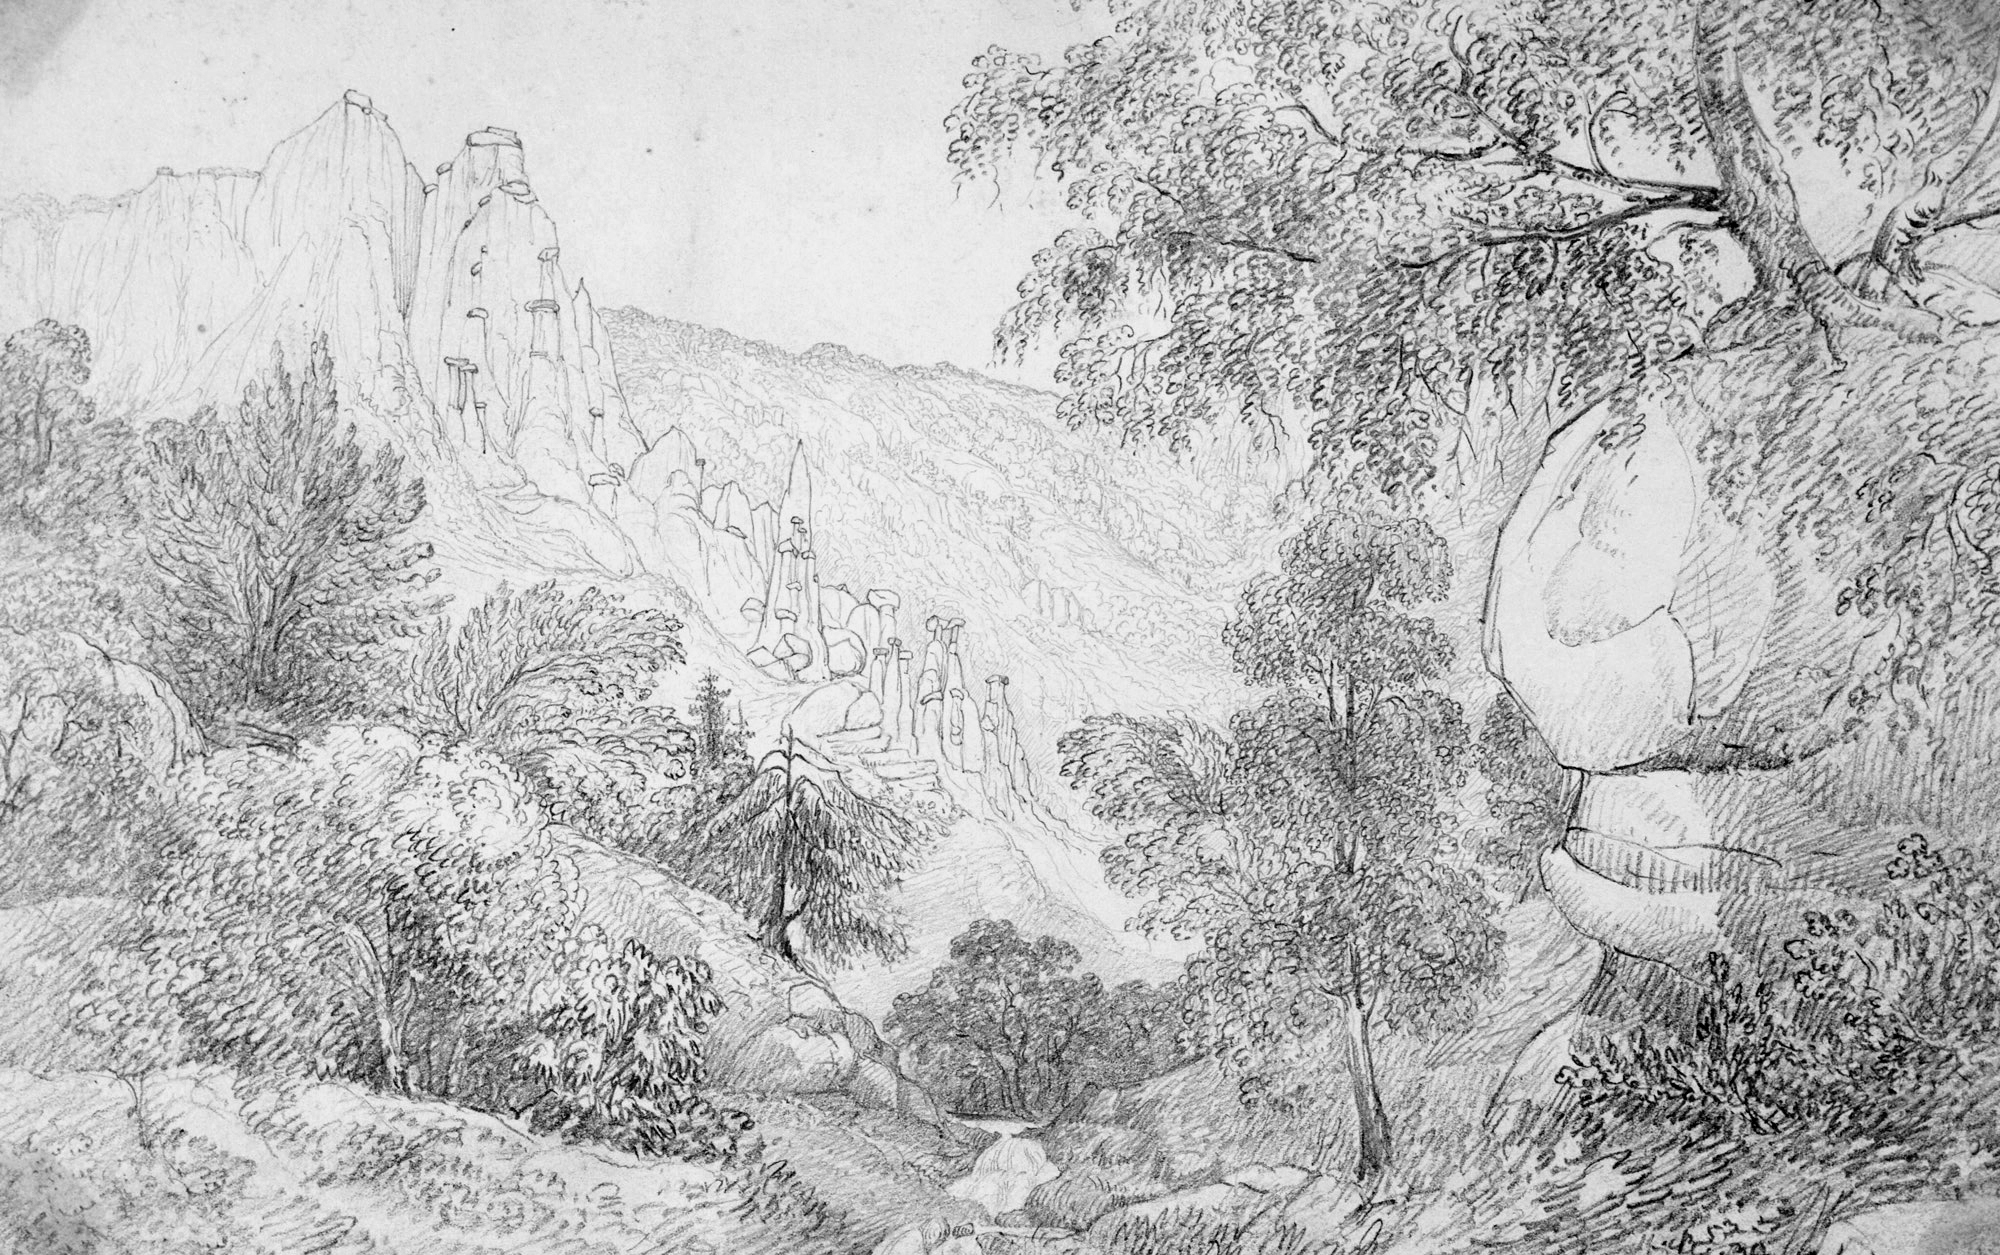 Sir John Herschel, Clay Columns at Stalde-in-the-Visp Thal Valais Sept. 4 1821